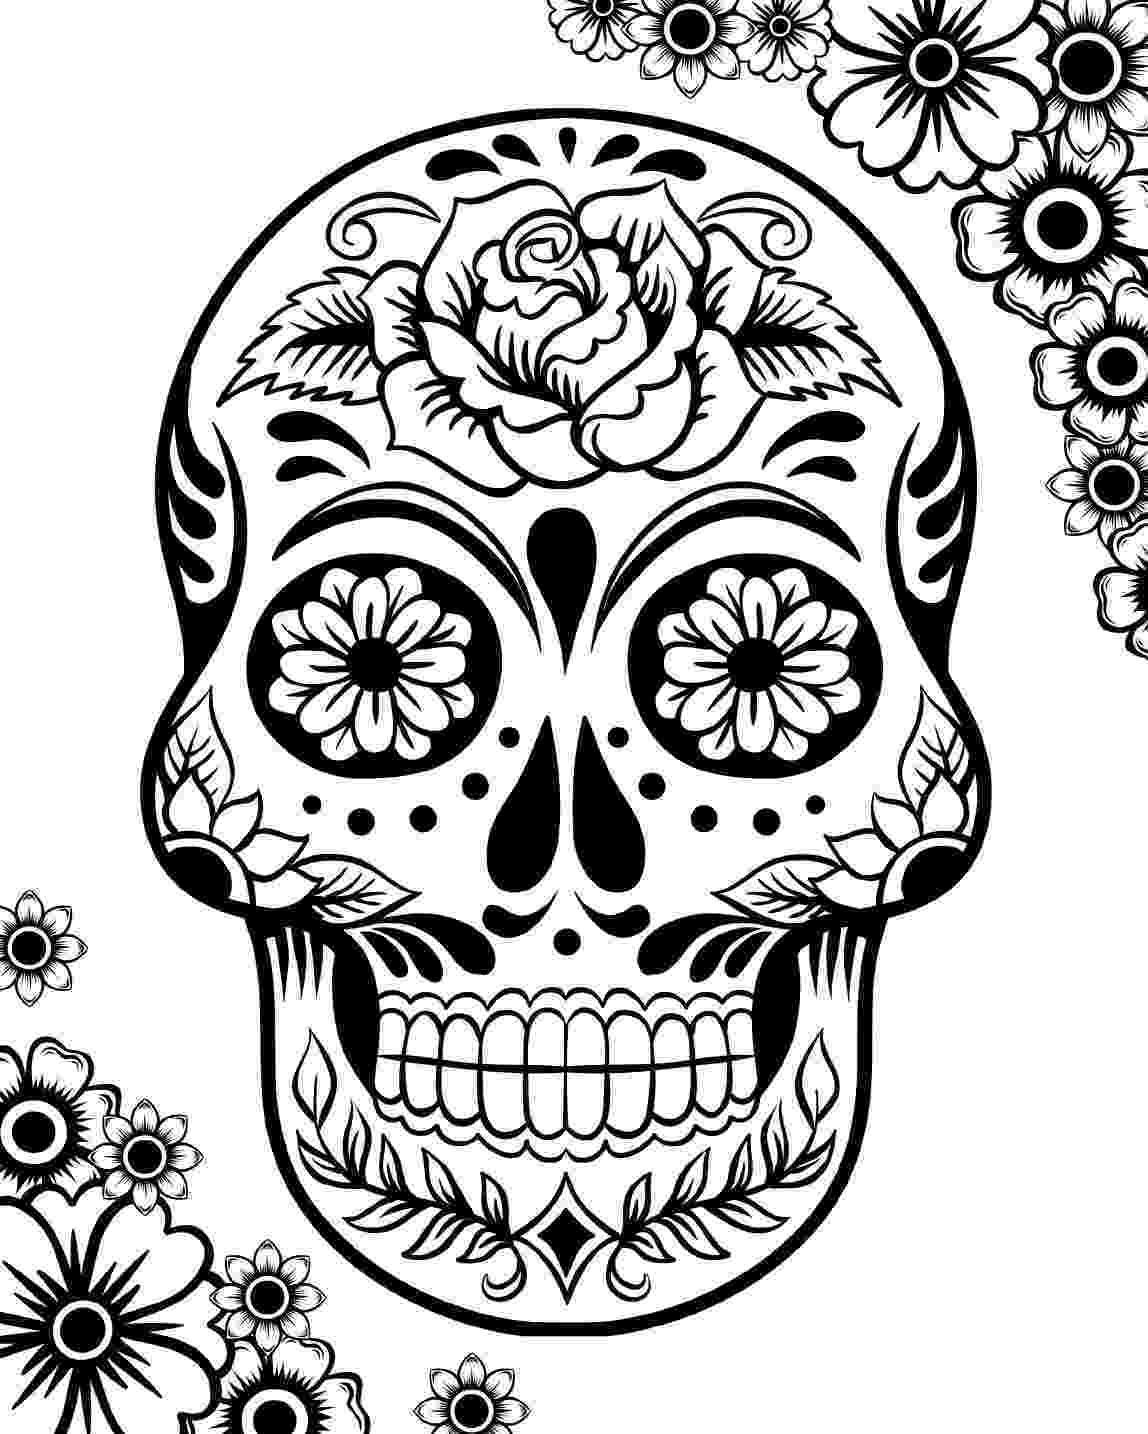 skull coloring sheet free printable skull coloring pages for kids skull coloring sheet